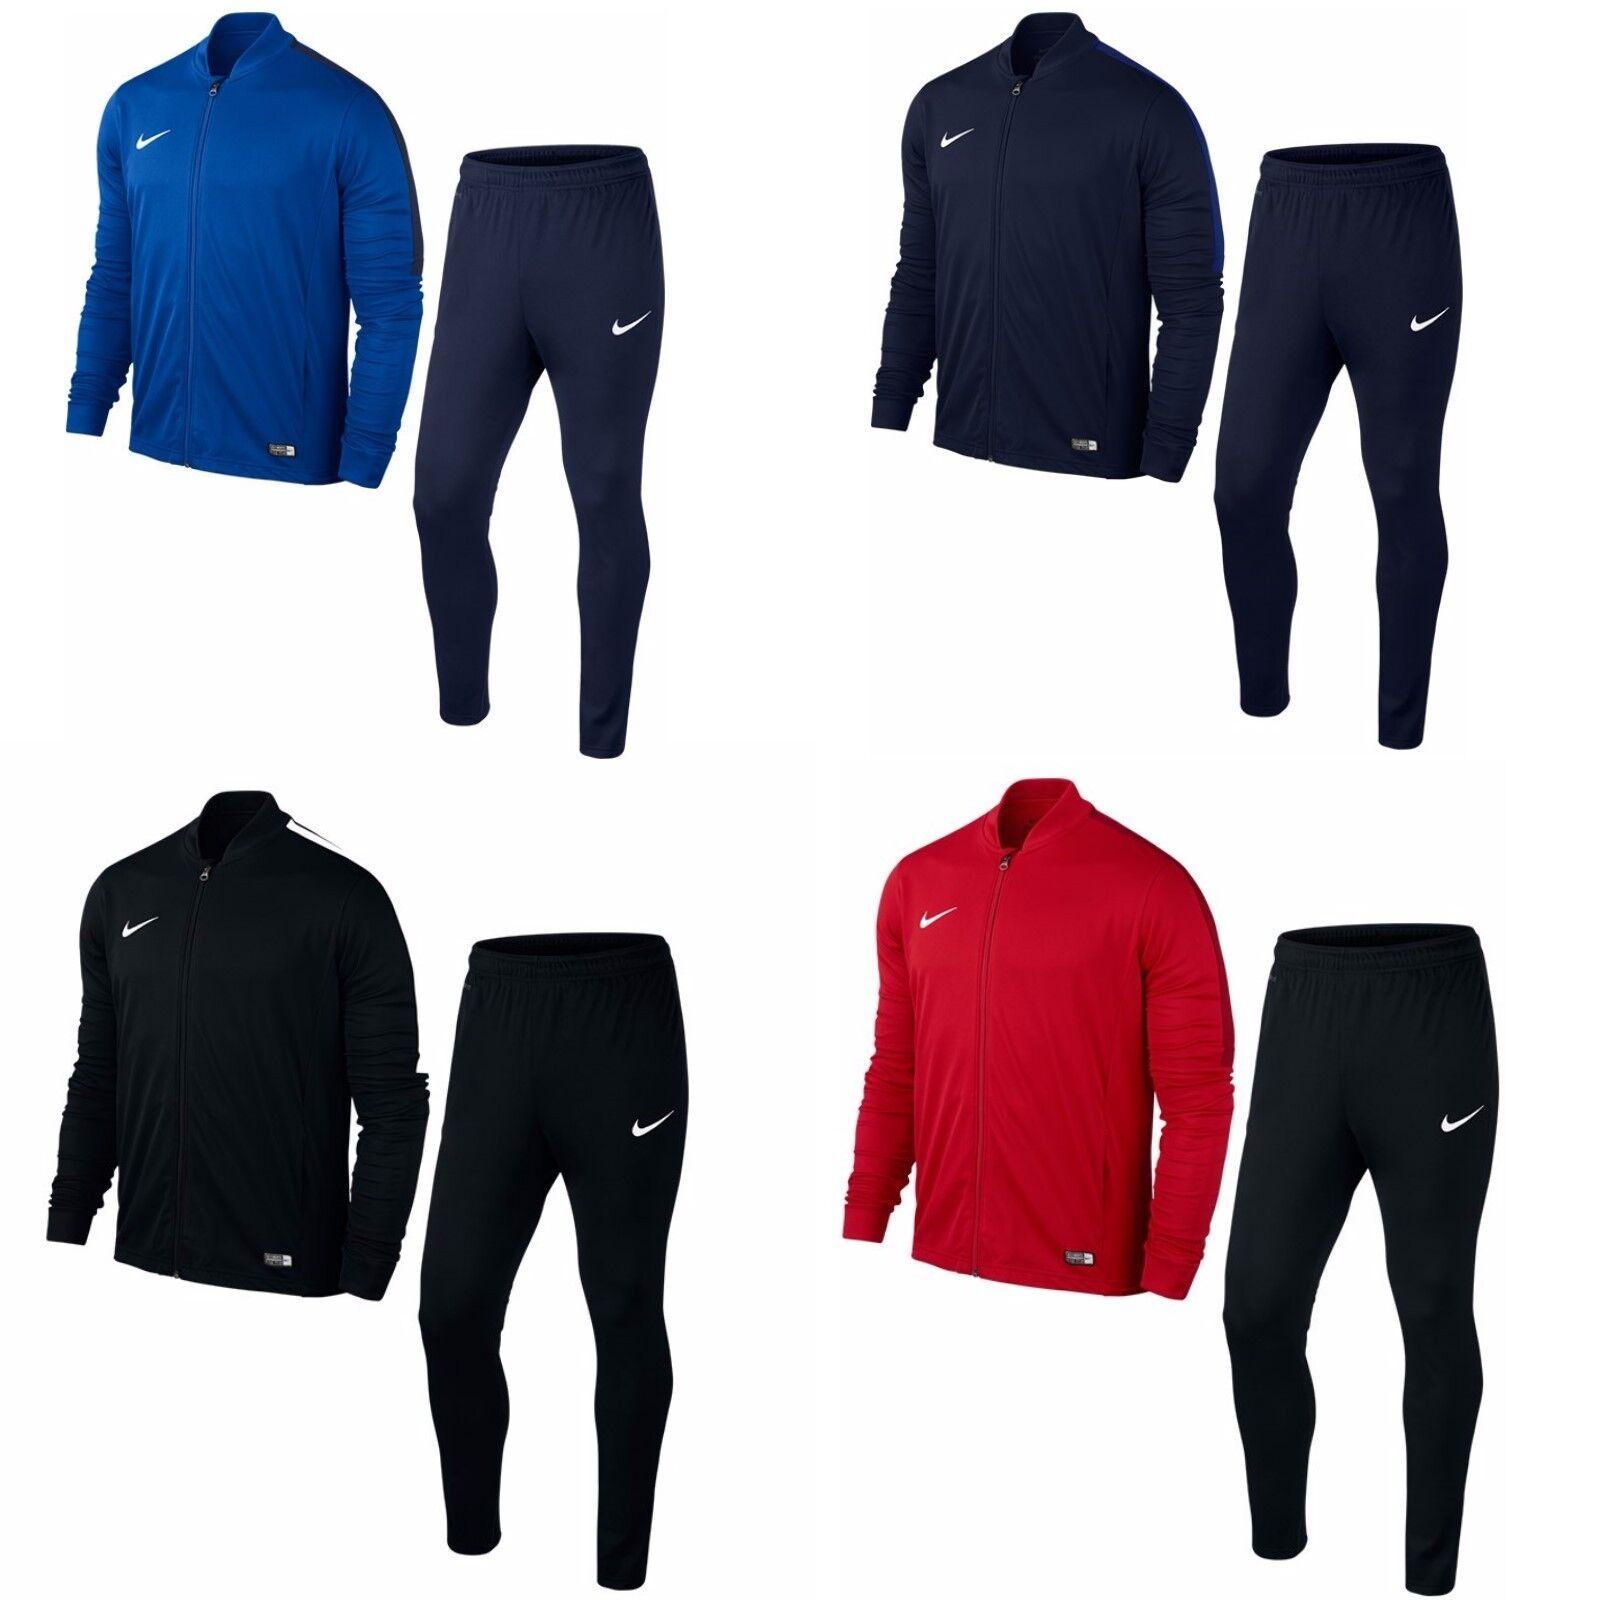 Nike Trainingsanzug Sportanzug Jogginganzug Herren dünner Stoff Dri-FIT schwarz